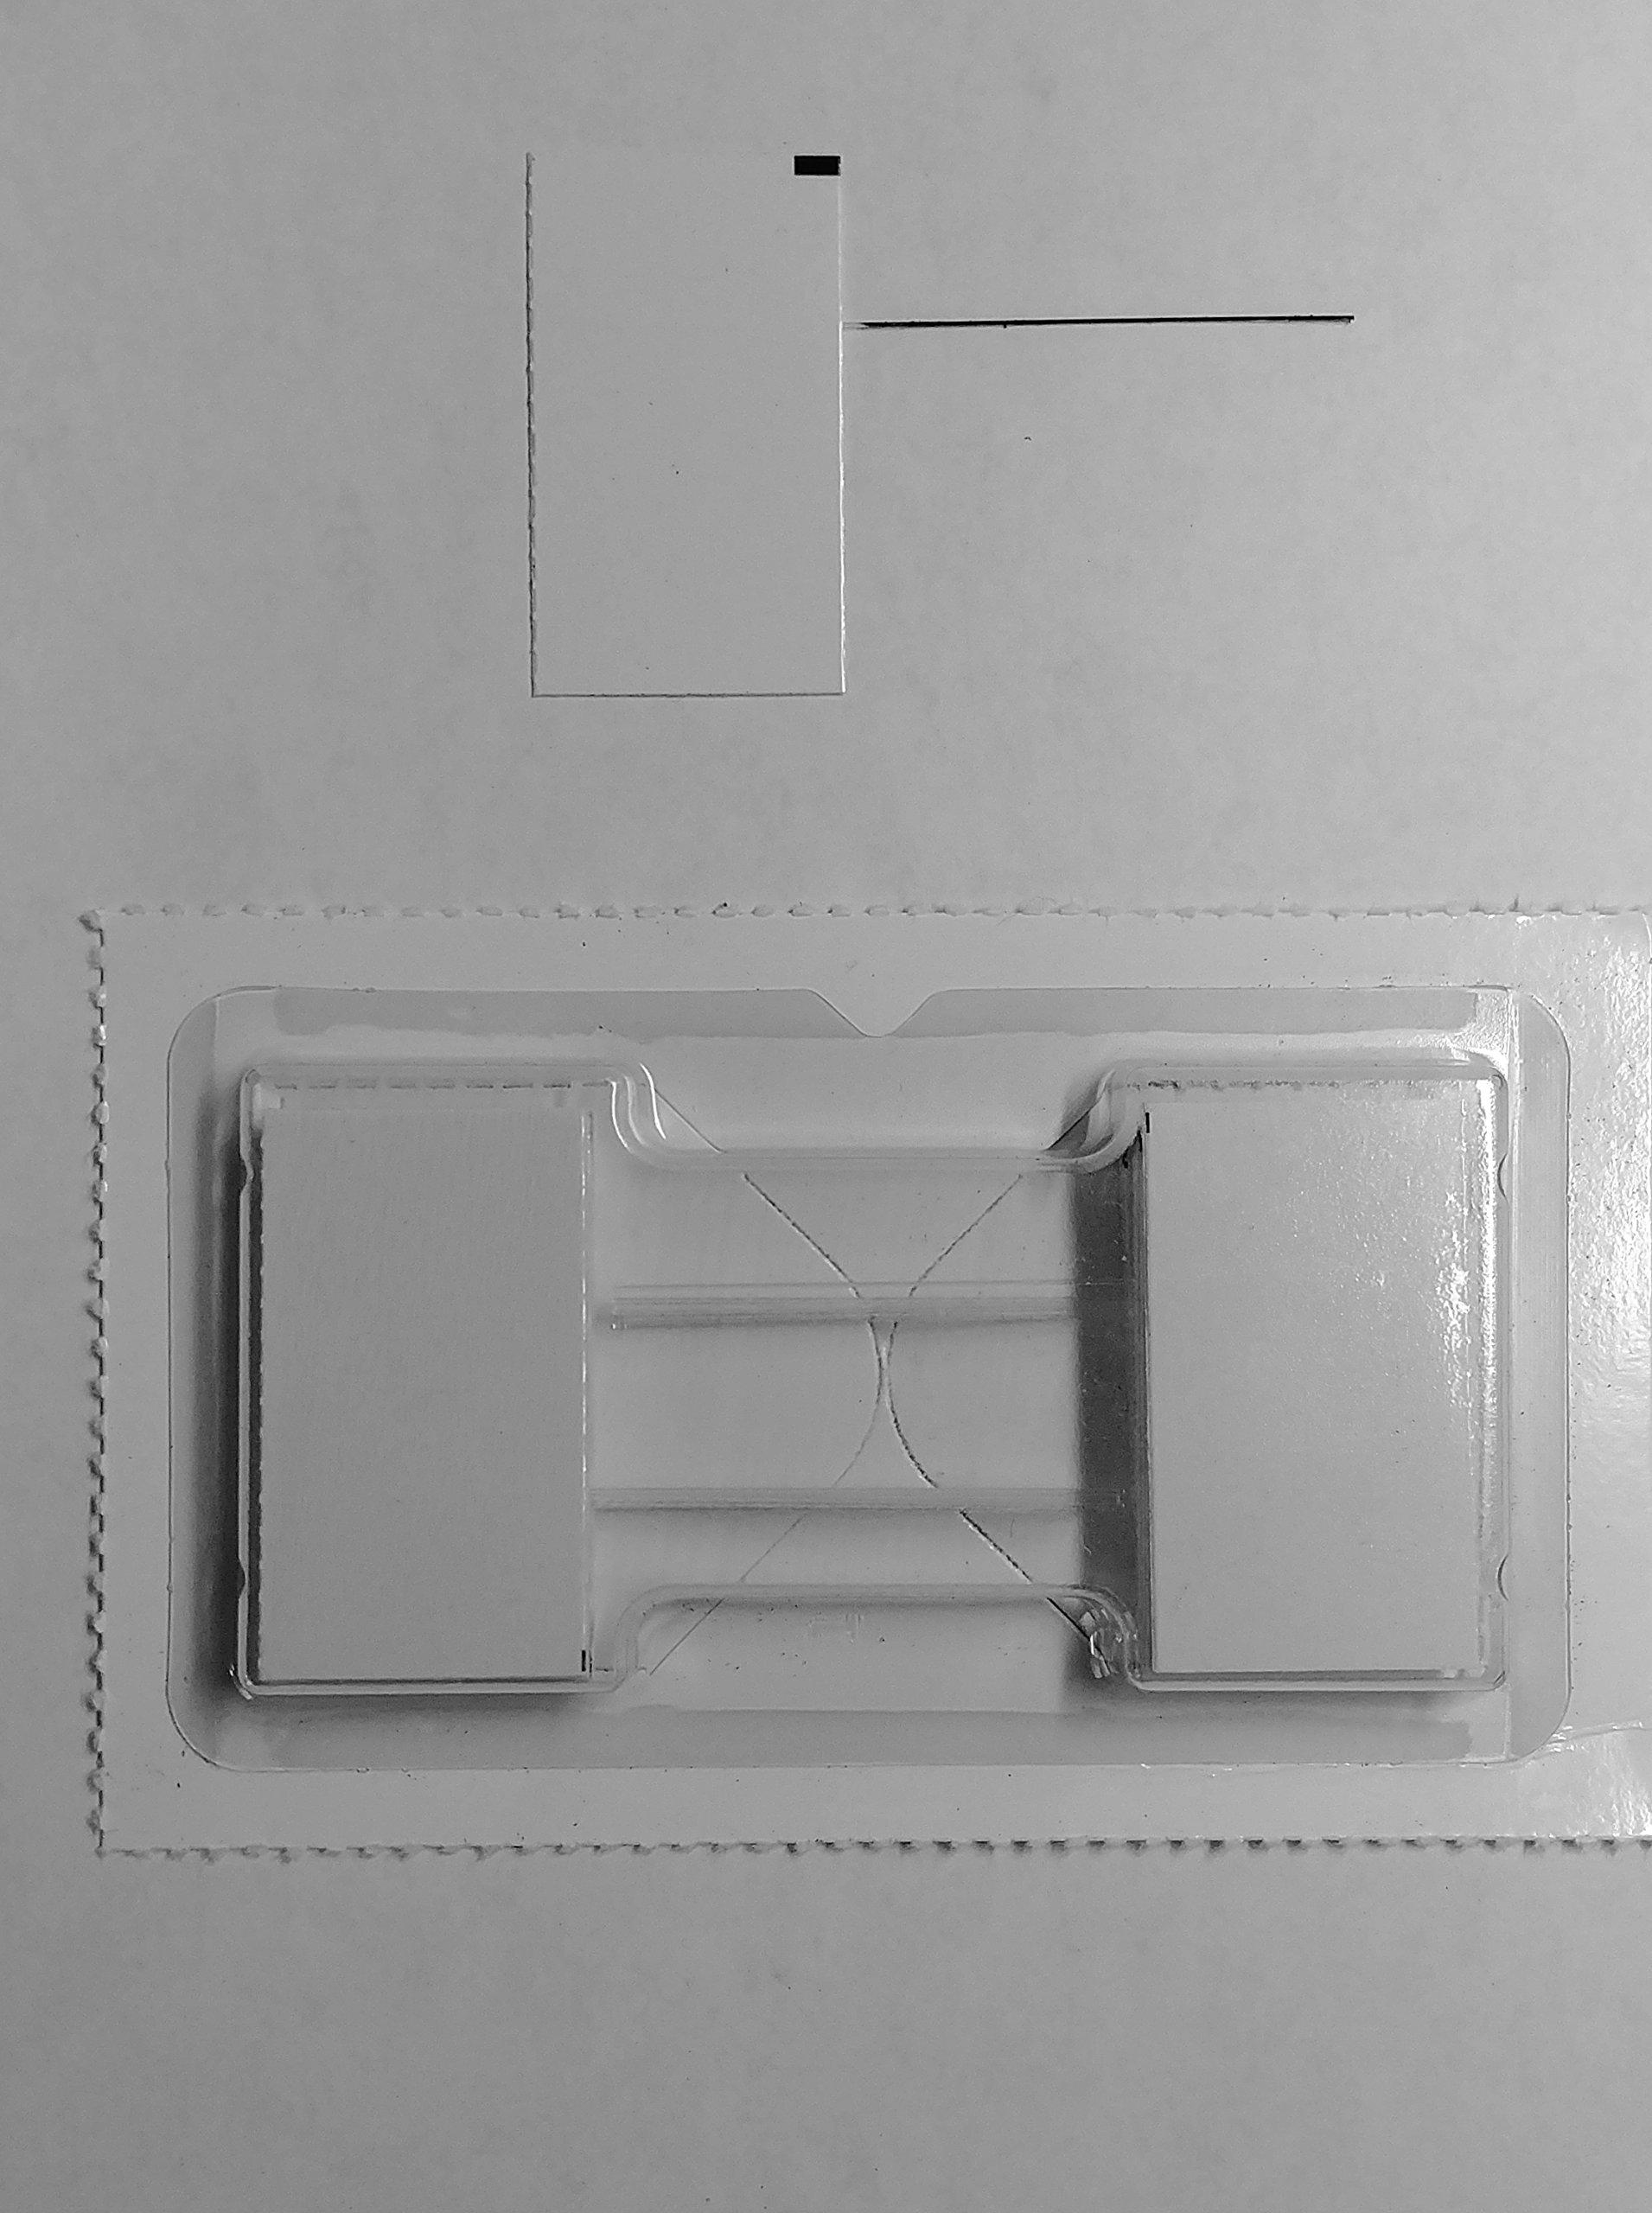 Semmes Weinstein Monofilament Wire 5.07 10g Neuropathy Diabetic Testing Kits, 20 Disposable Filaments by Atlas Biomechanics